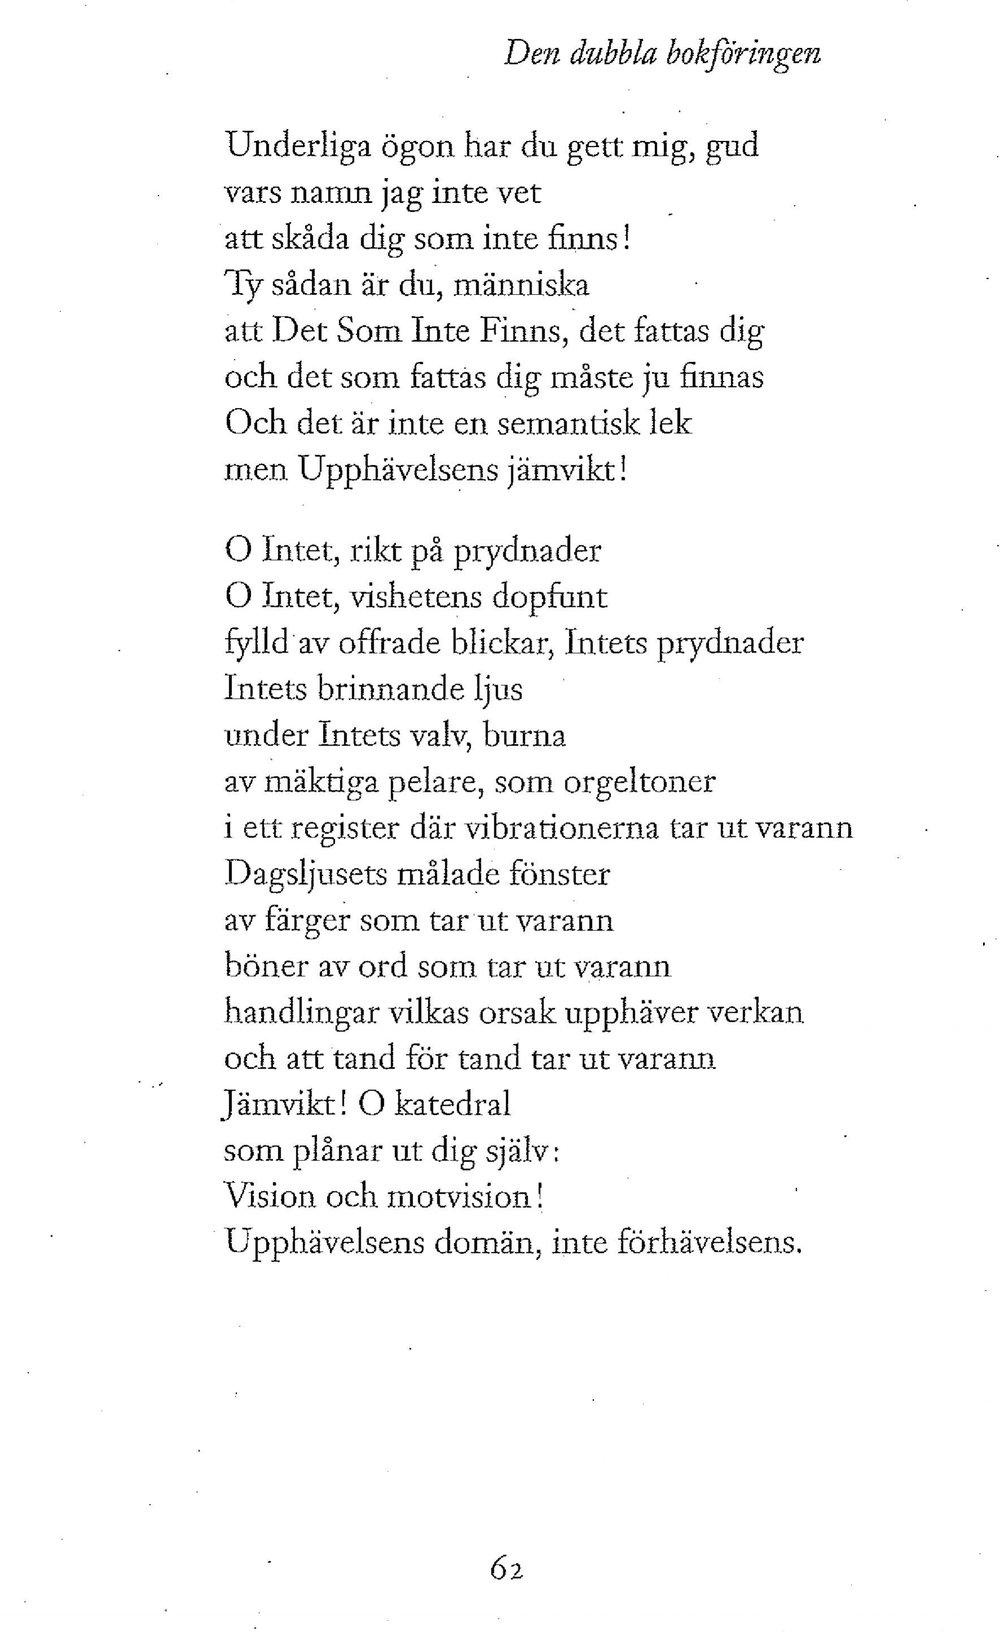 Gunnar Ekelöf, Samlade dikter II , 2017,s. 62